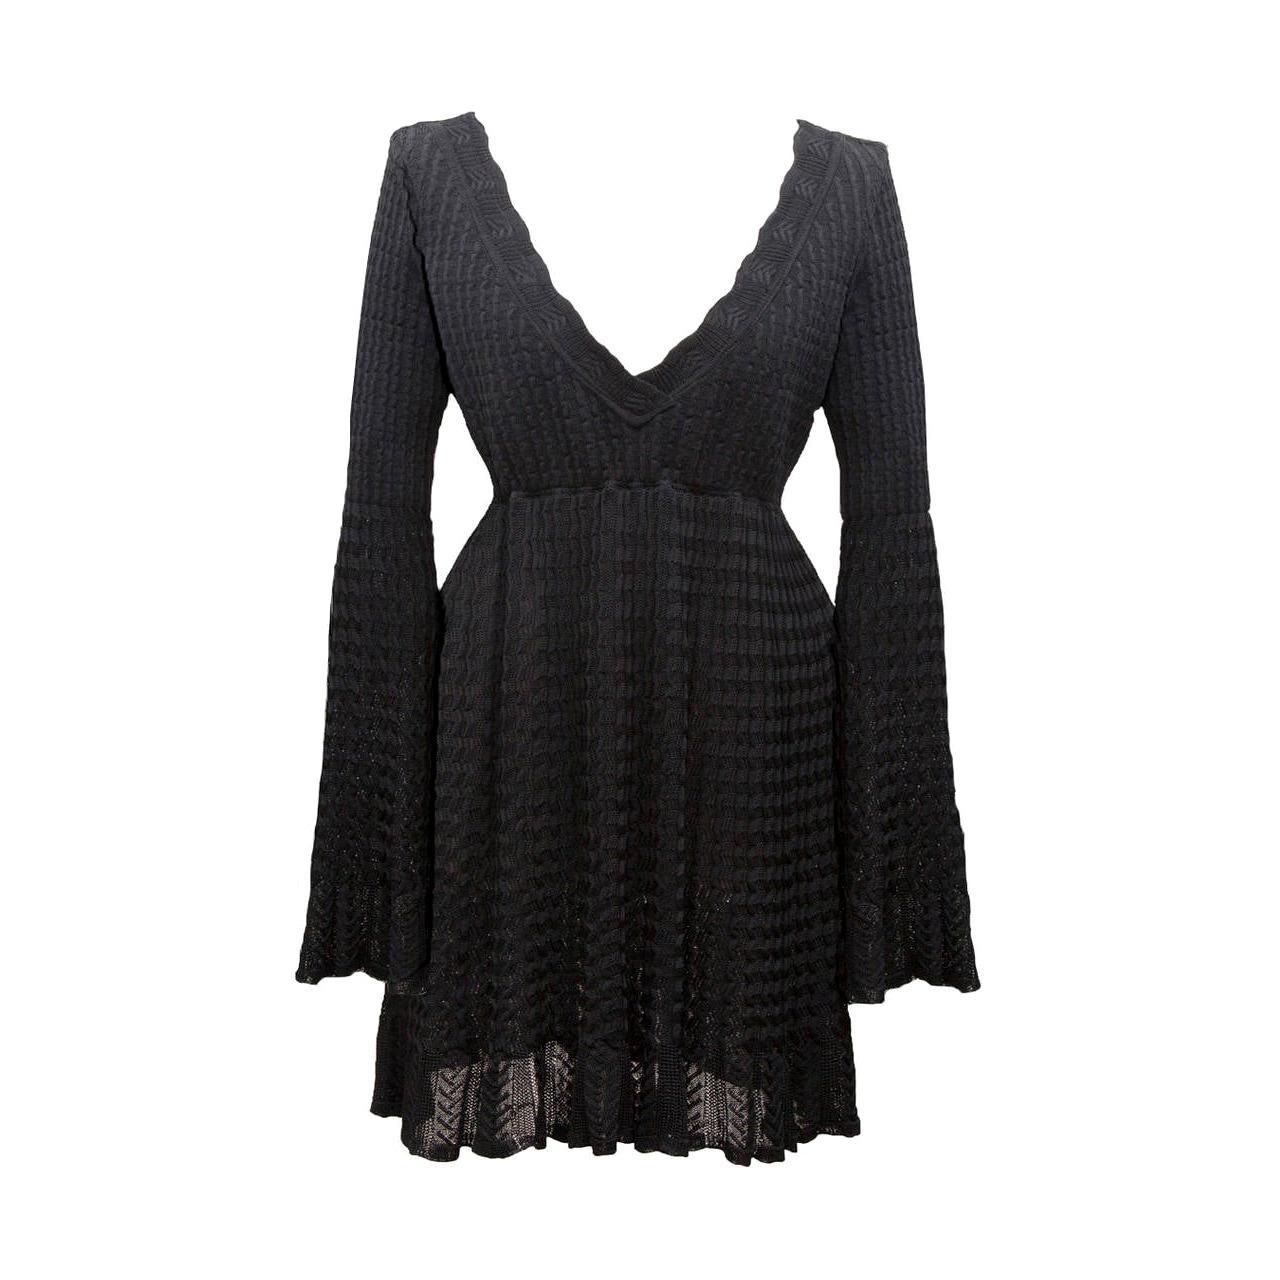 Azzedine Alaia Black Knit Dress Top 1992